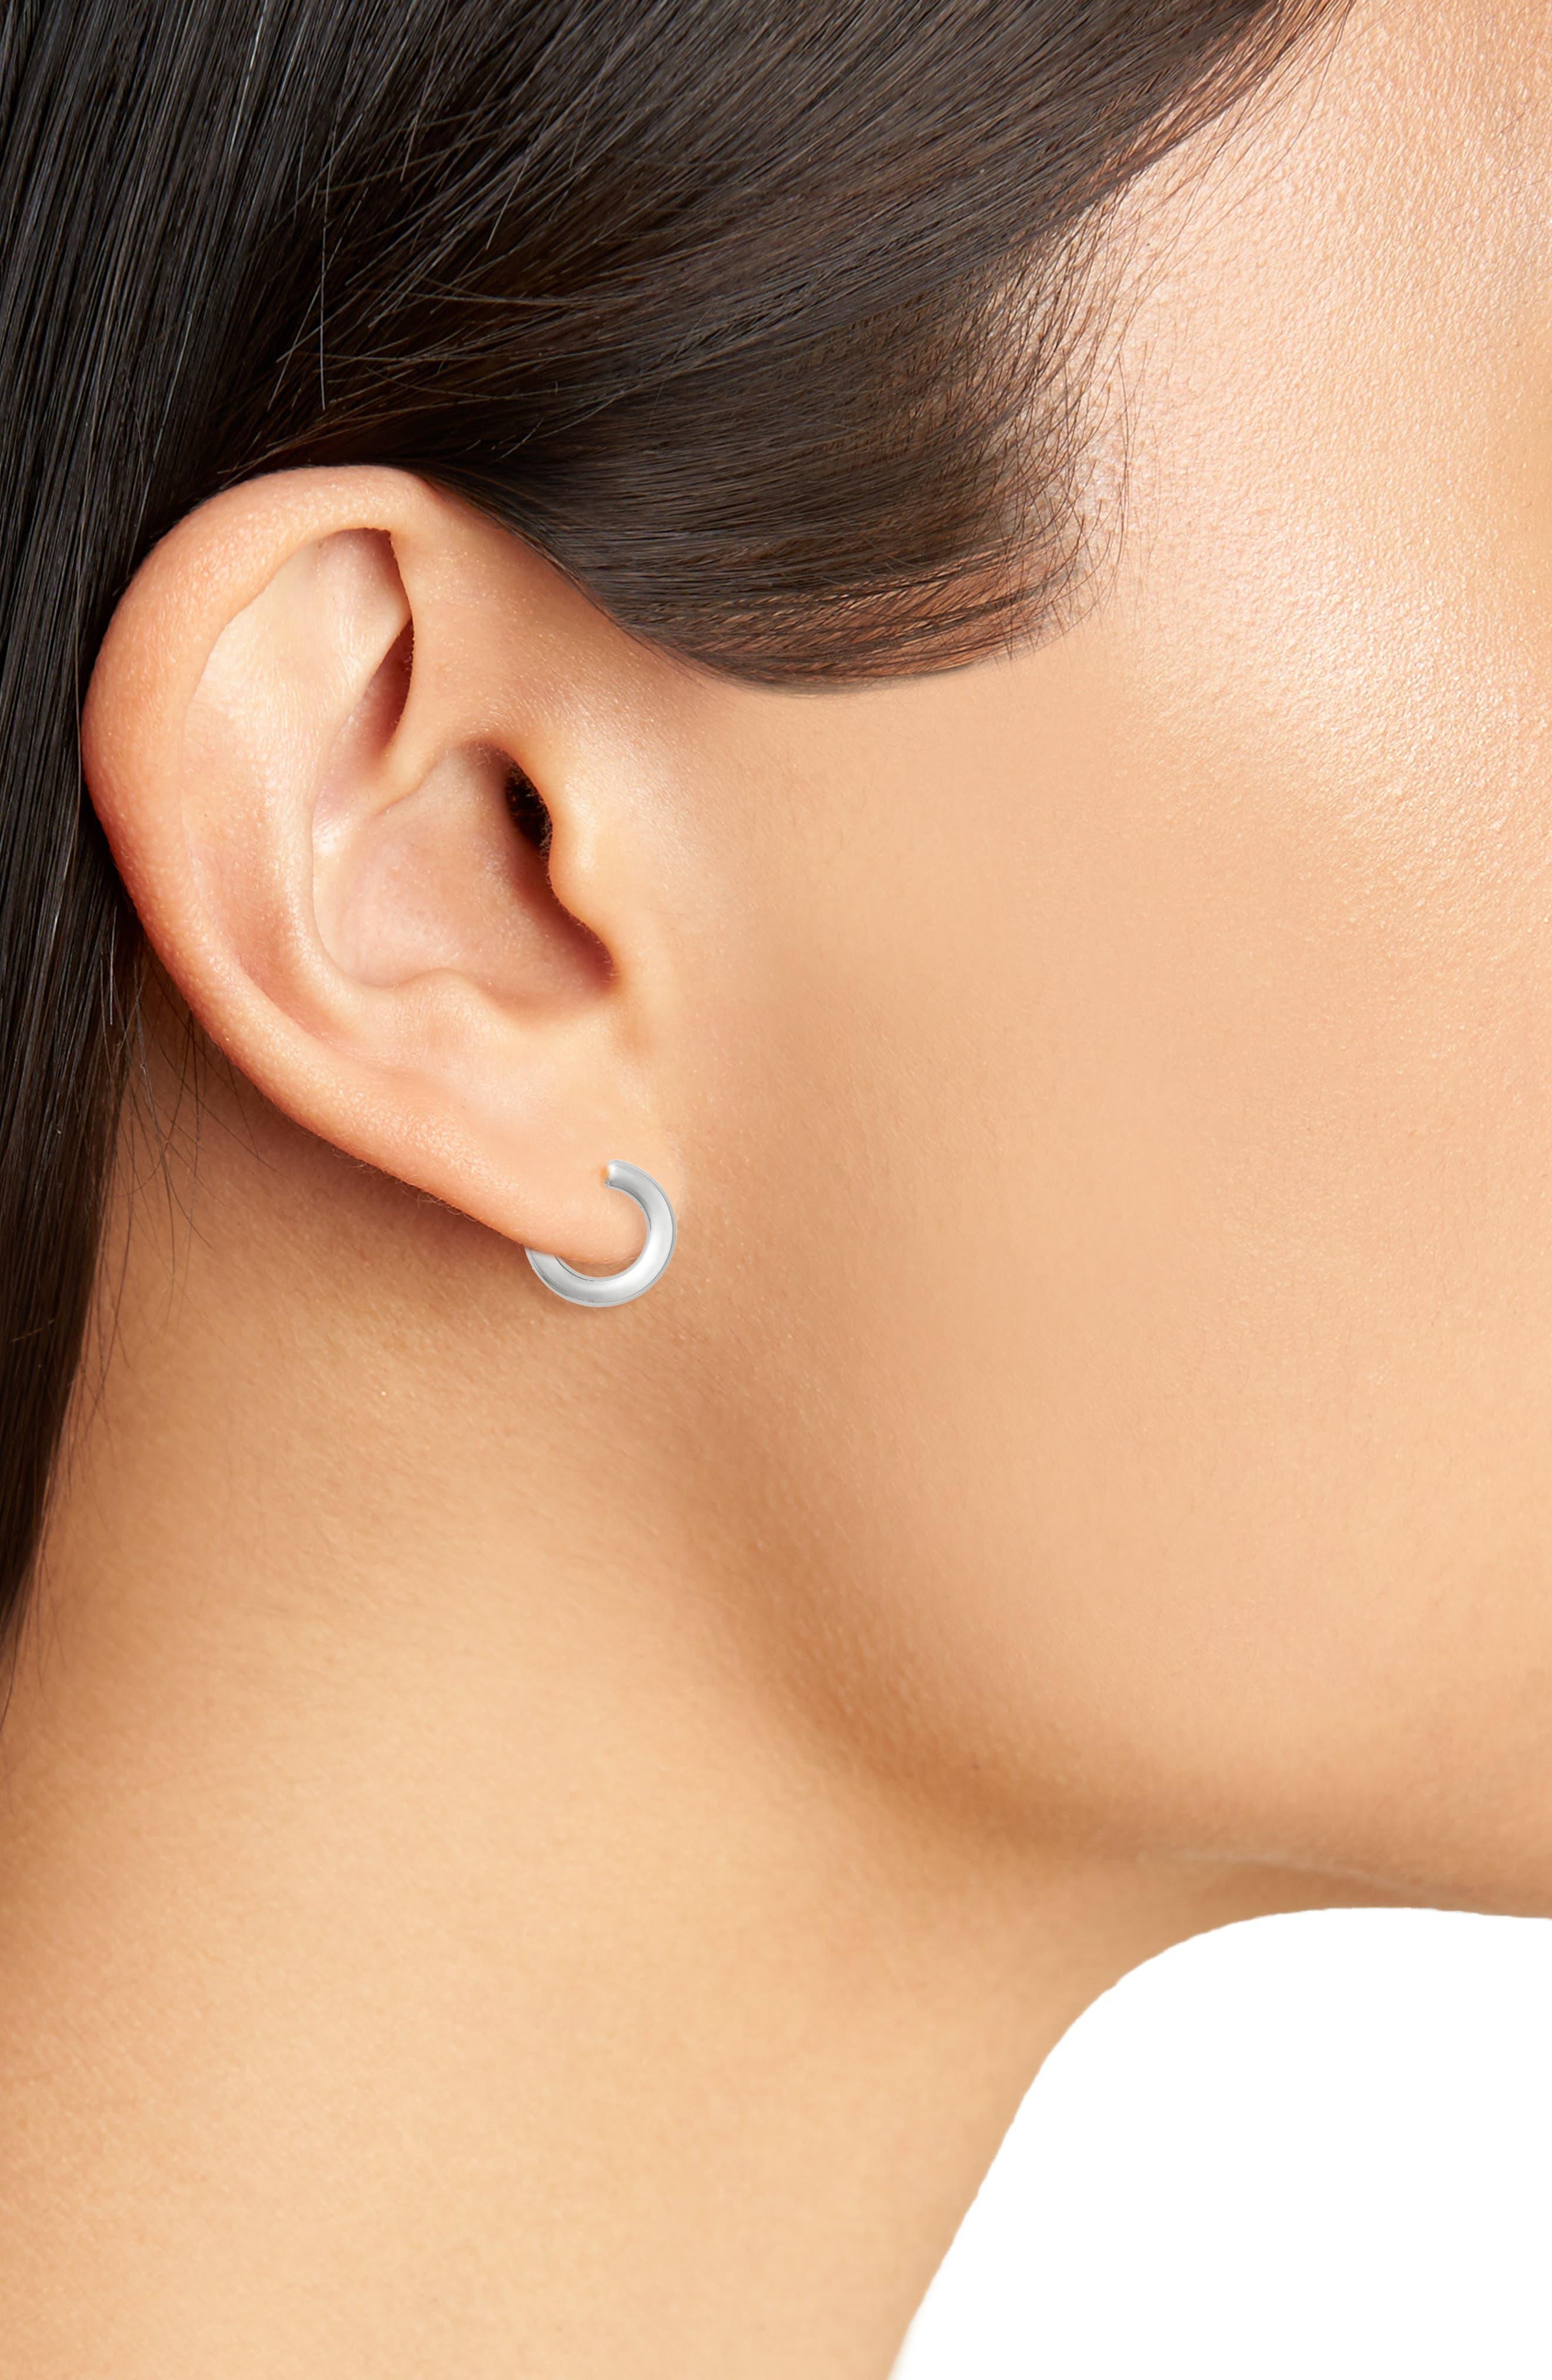 Small Hoop Earrings,                             Alternate thumbnail 2, color,                             040